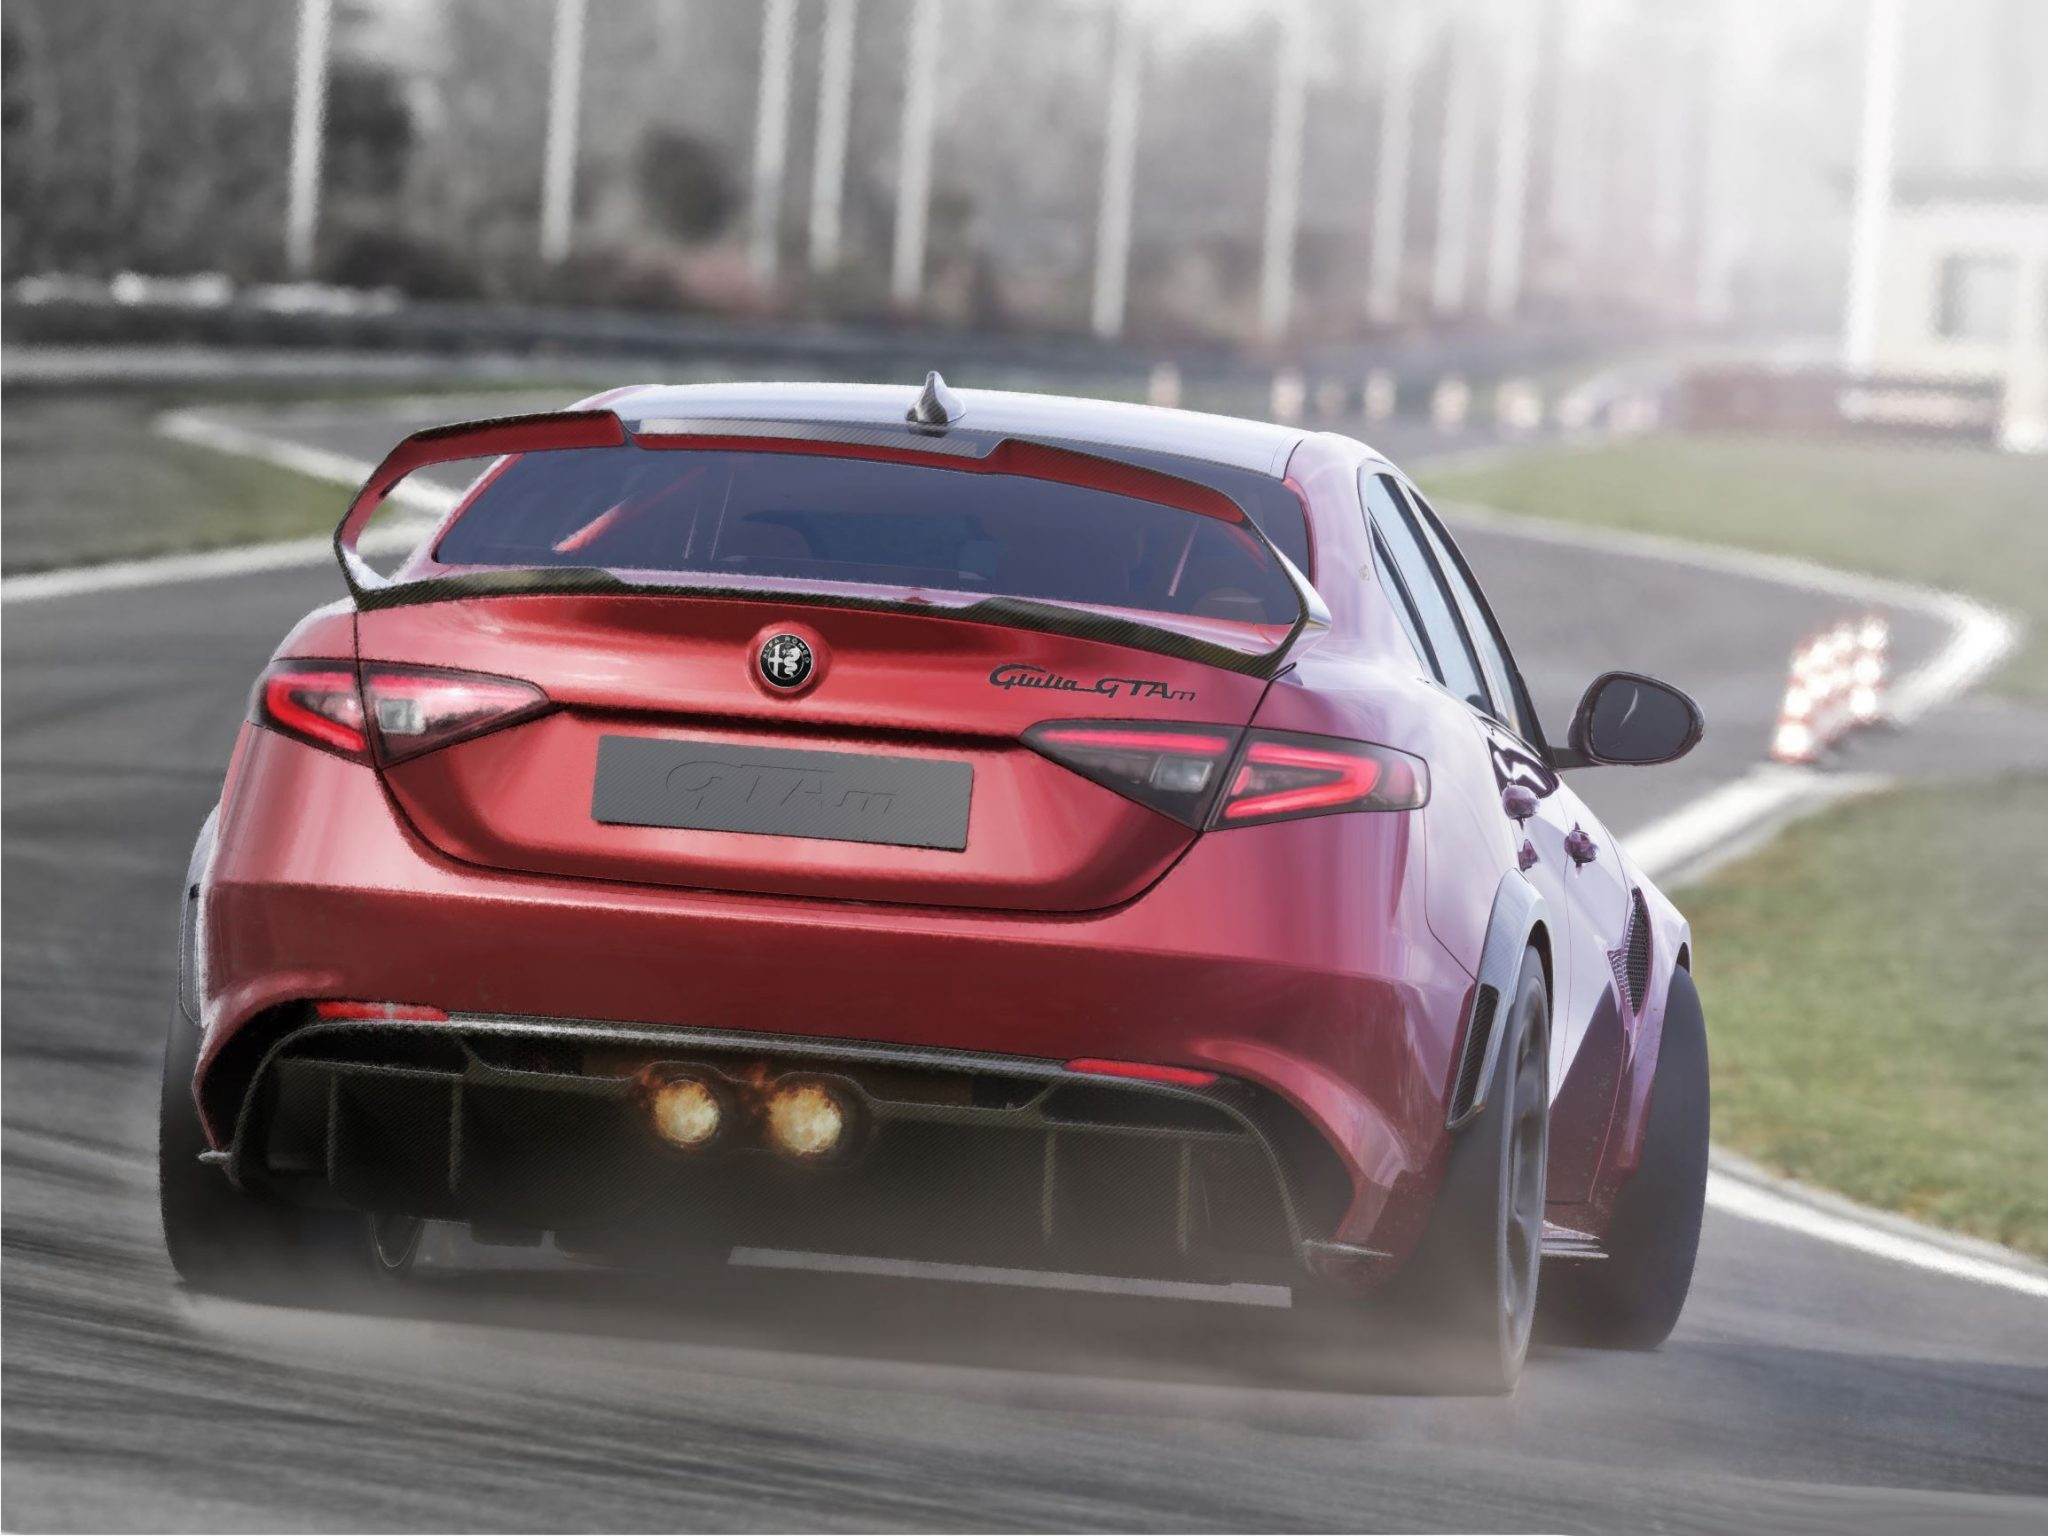 Alfa Romeo Giulia GTA GTAm pista 2